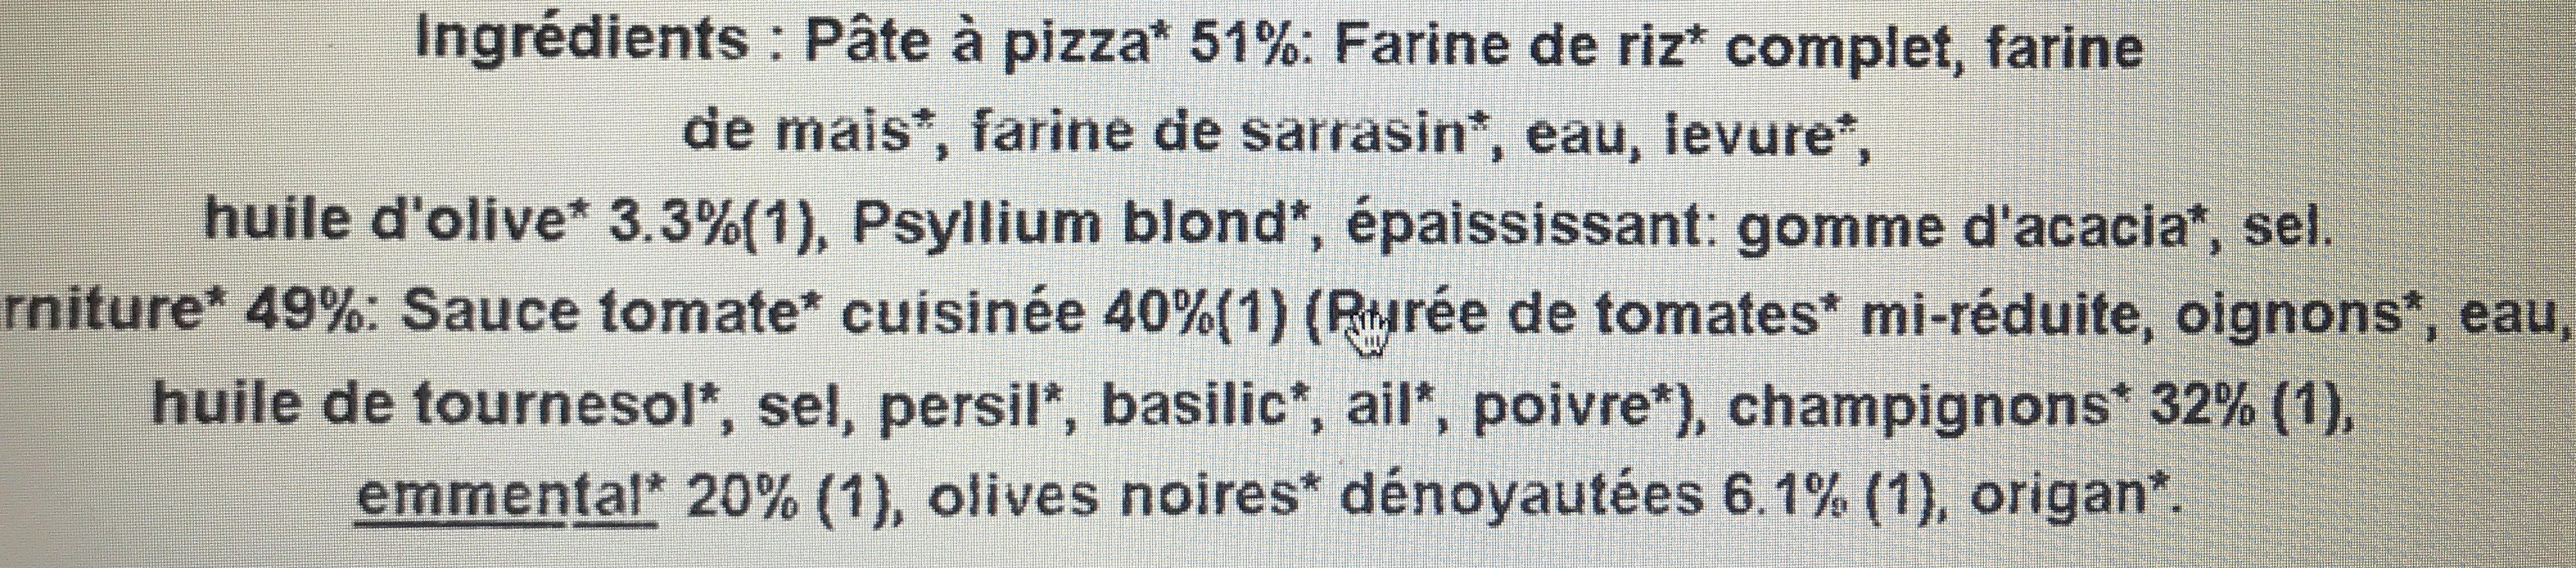 Pizza Bio' au sarrasin Champignons - Ingrédients